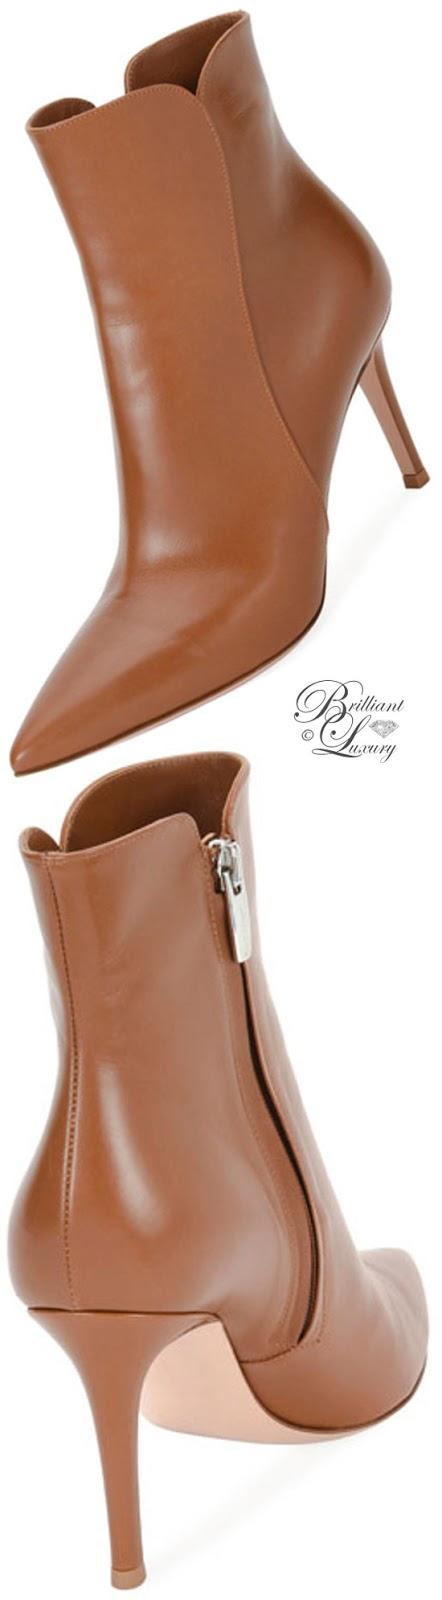 Brilliant Luxury ♦ Gianvito Rossi Calf Leather Booties